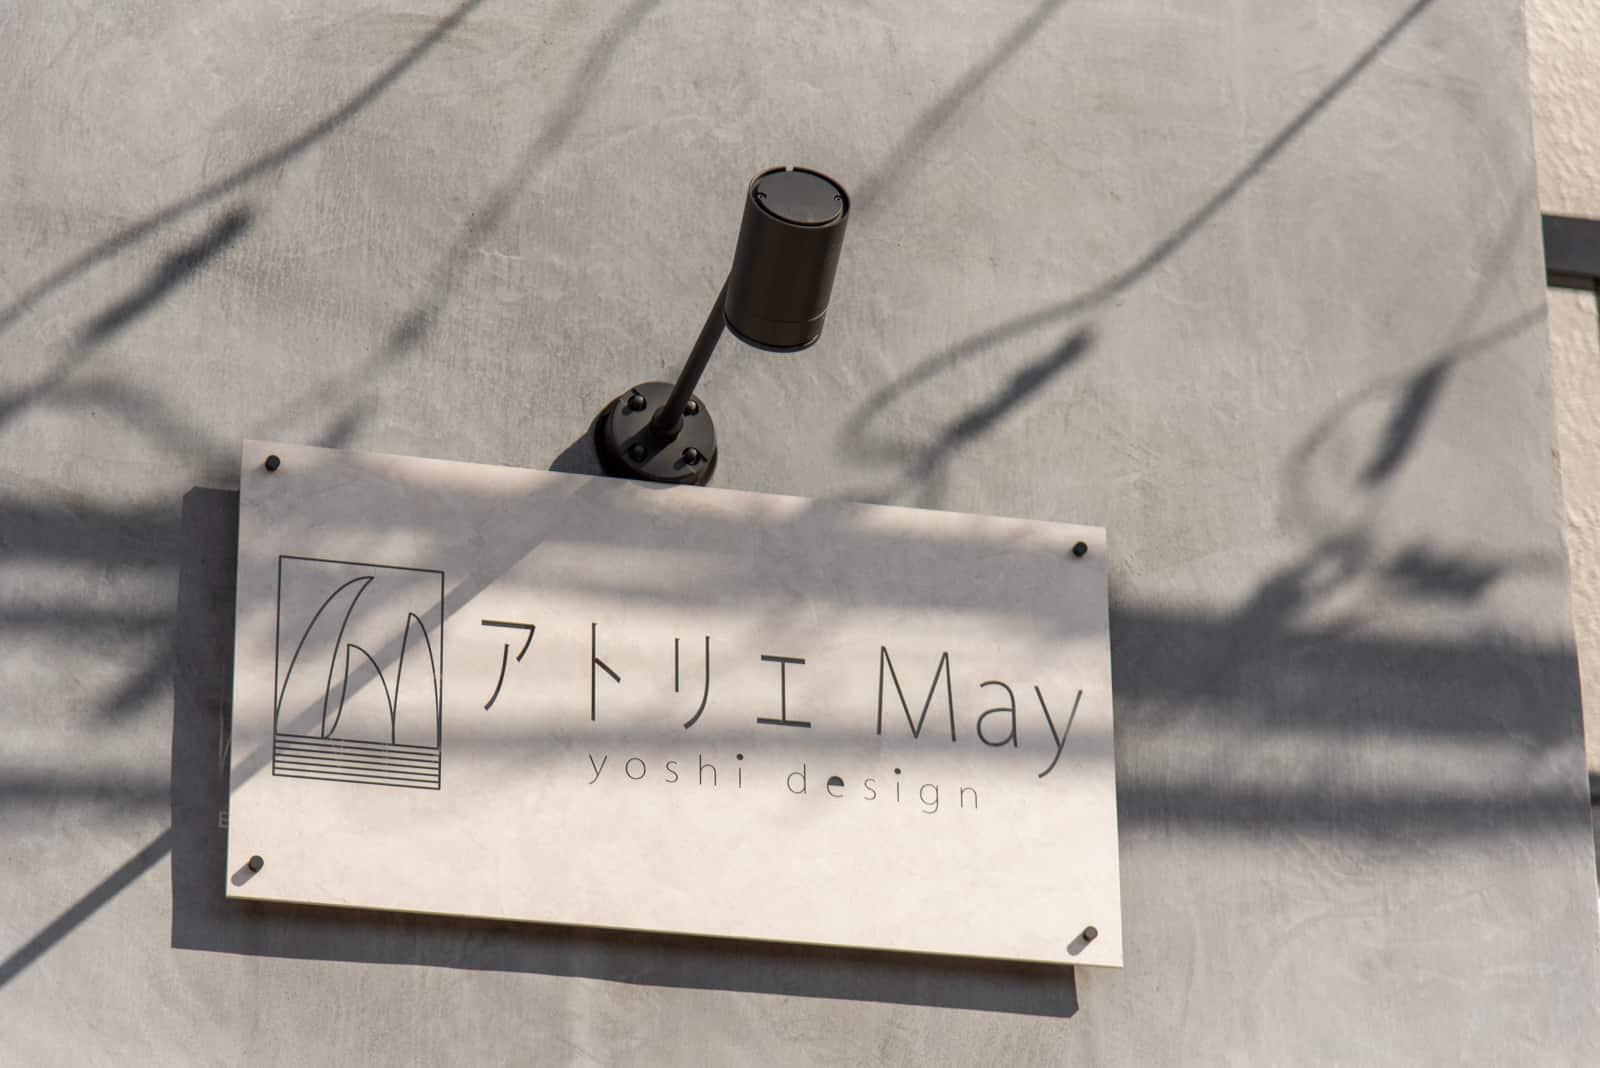 mayh-38